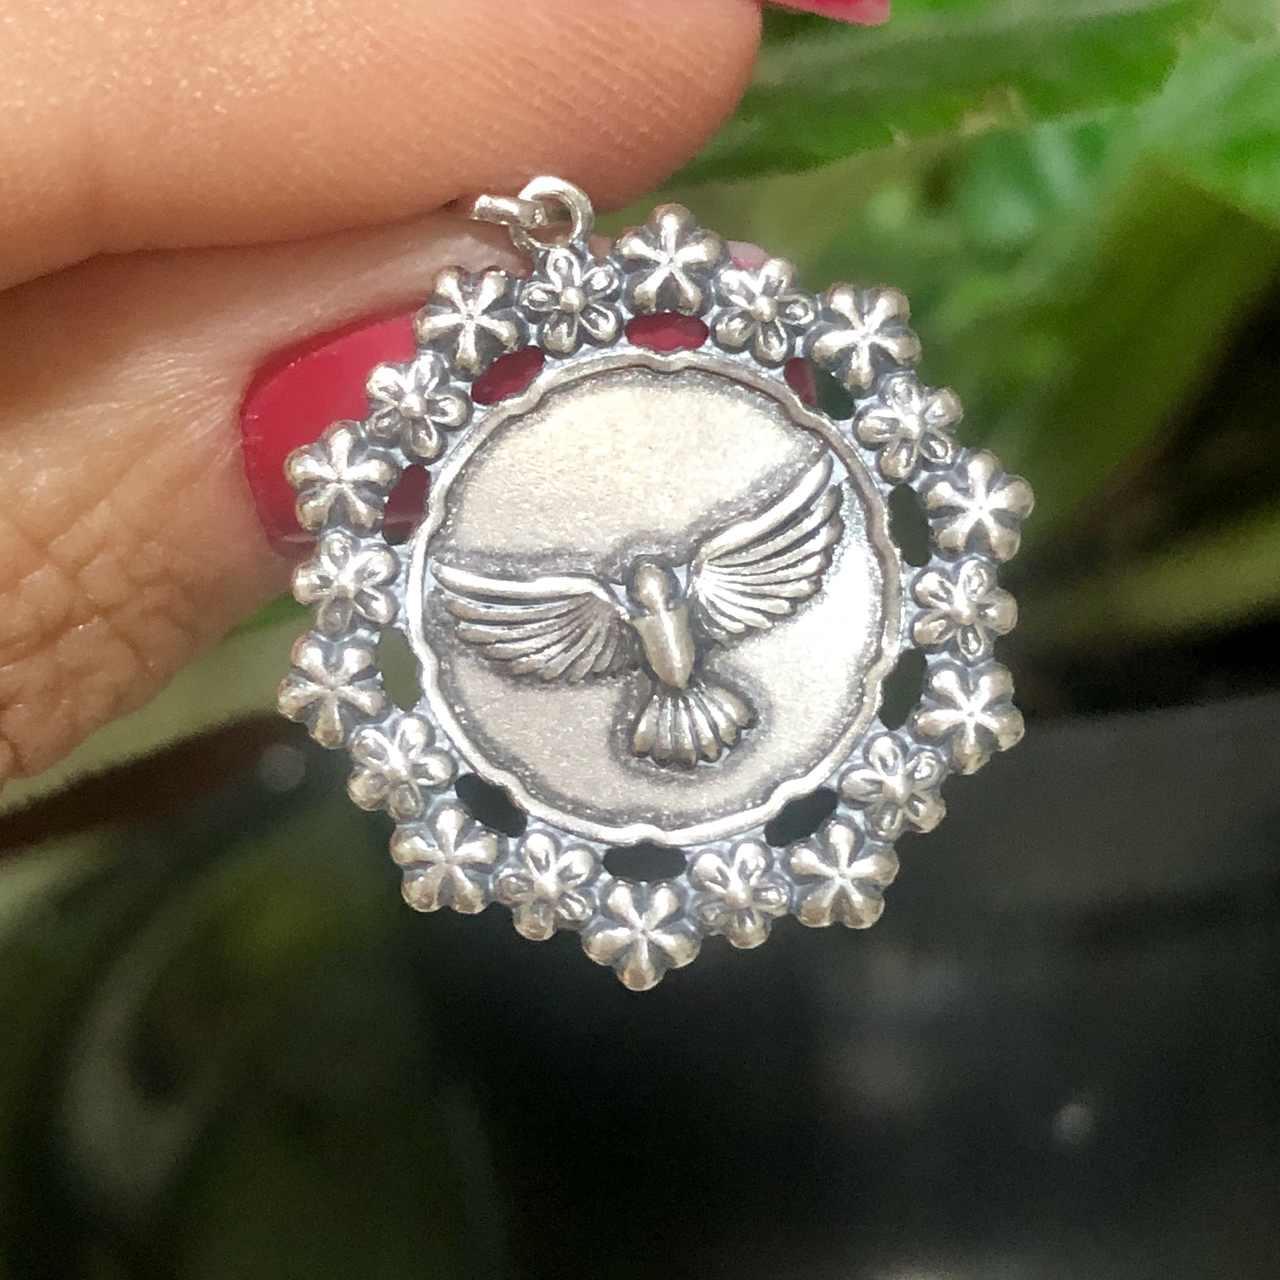 Pingente de Prata 925 Espírito Santo Circulo Flor